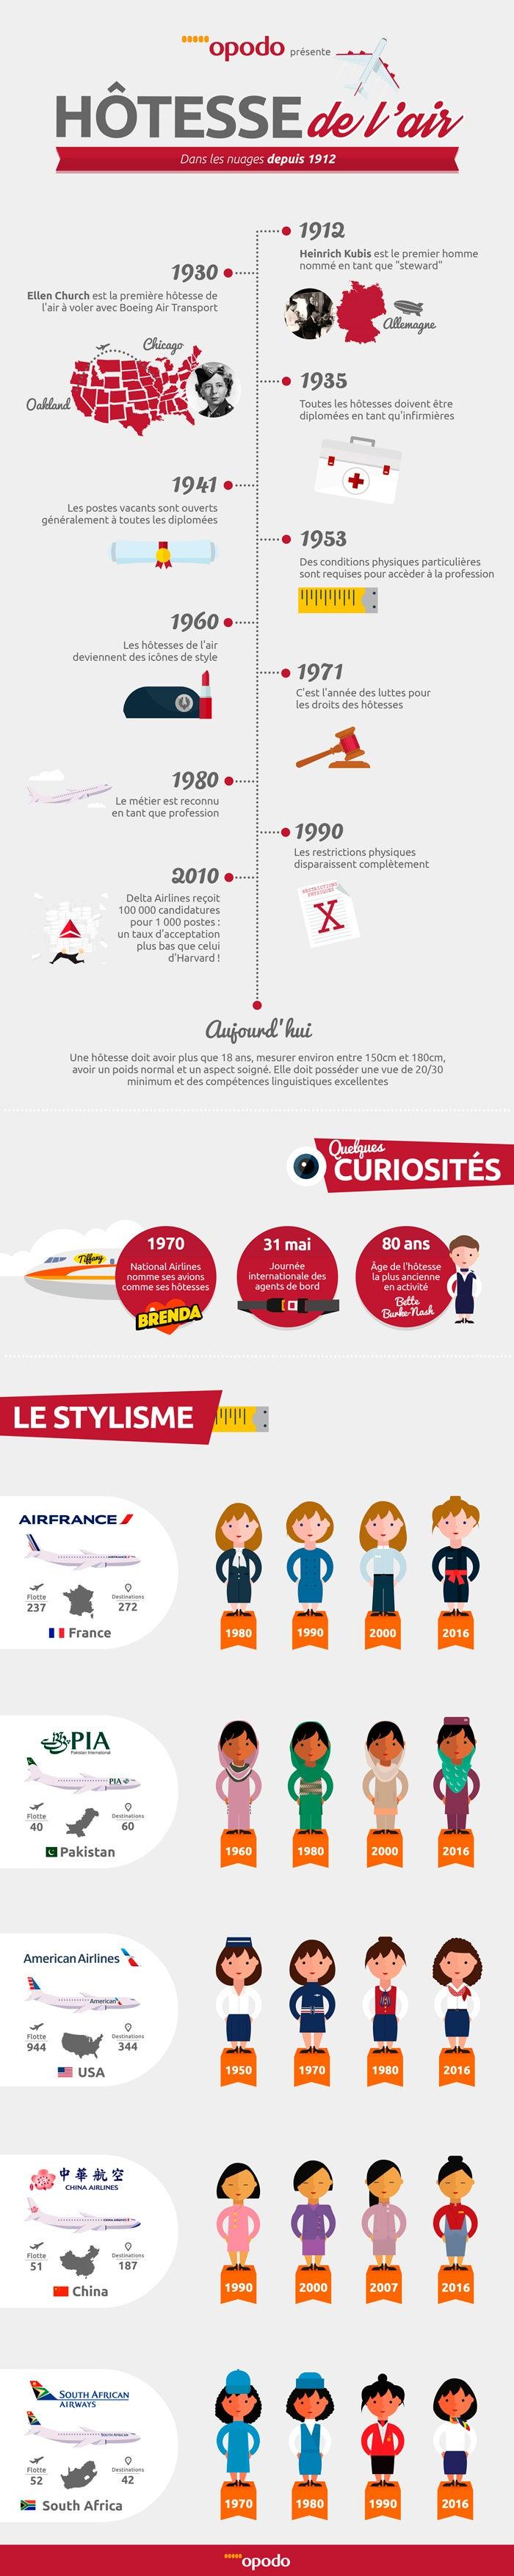 Infographique hotesse de l'air